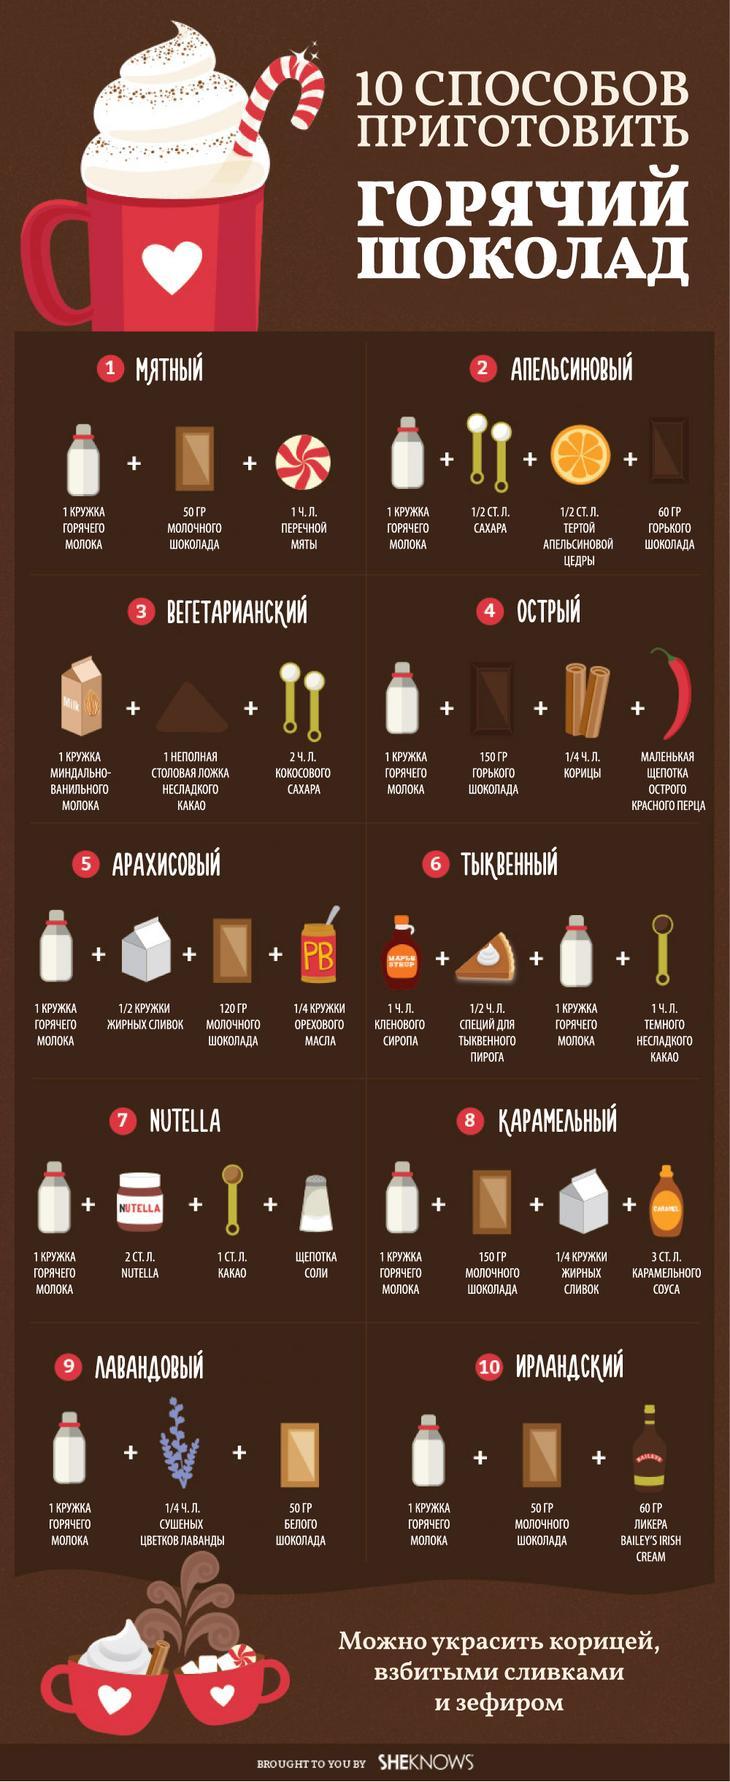 Приготовить горький шоколад в домашних условиях